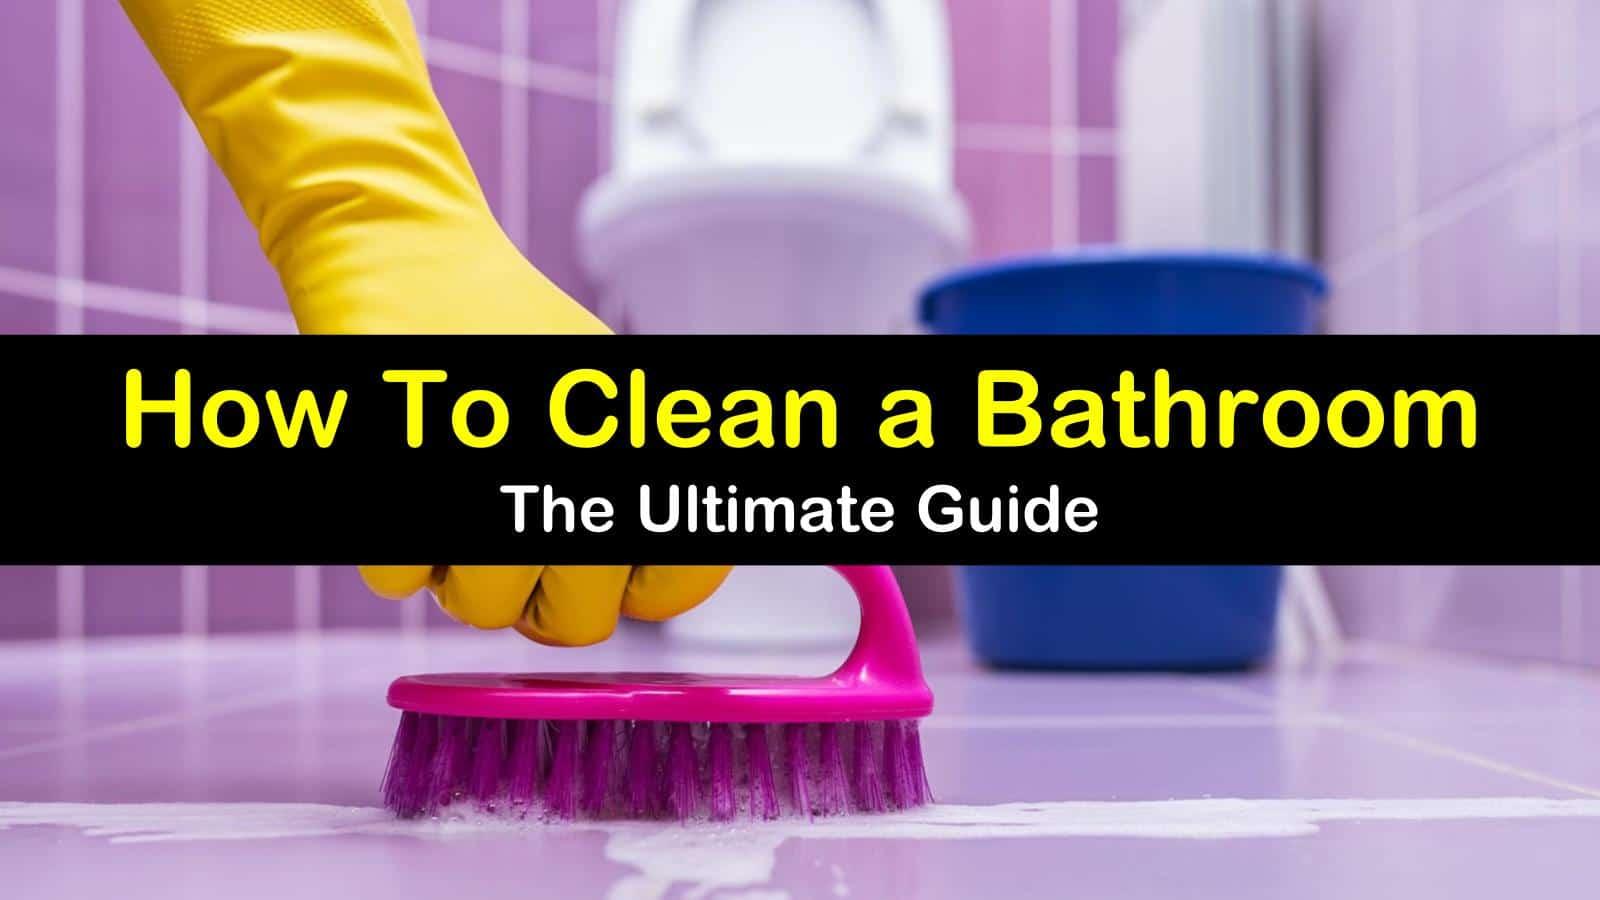 how to clean a bathroom titleimg1